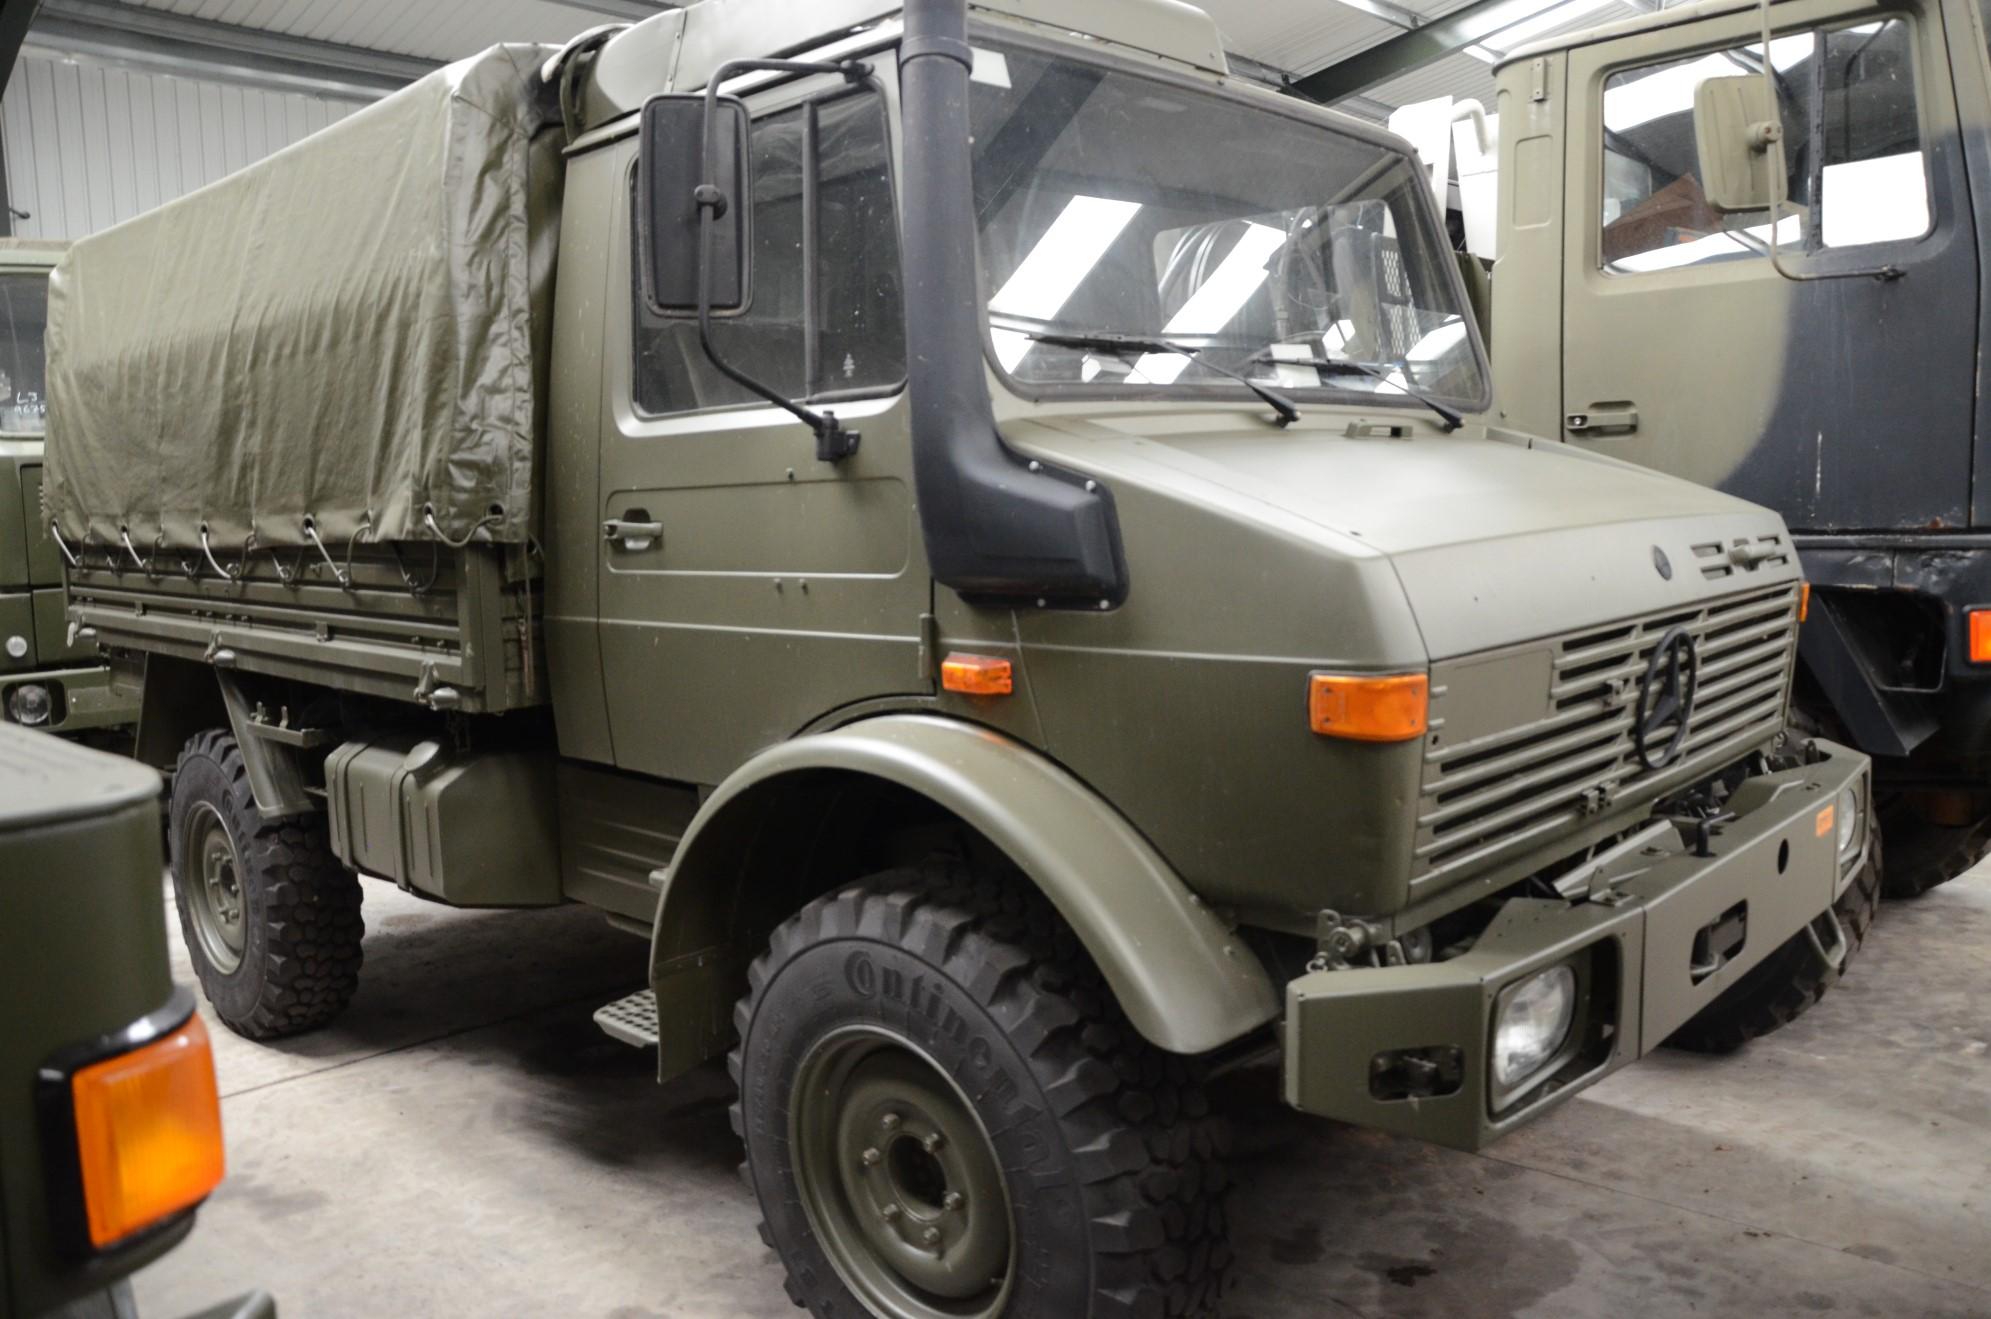 Mercedes Unimog  U1300L 4x4 Drop Side Cargo Truck | used military vehicles, MOD surplus for sale